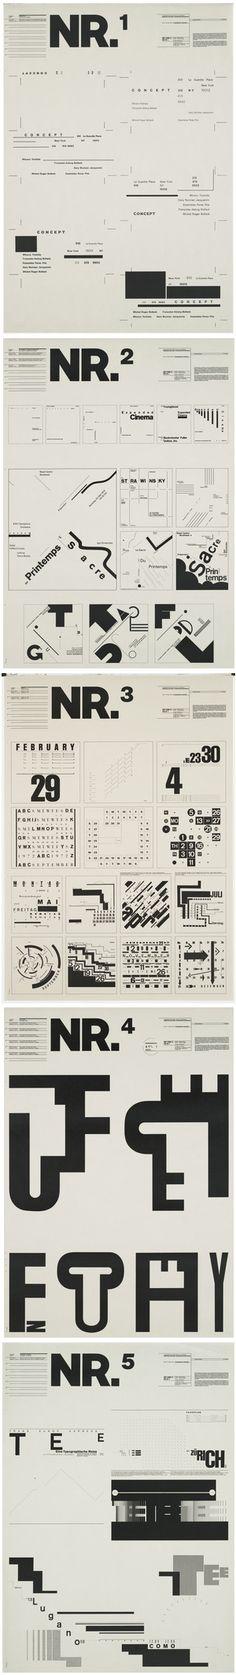 Typographic Process,  Wolfgang Weingart, 1971-72